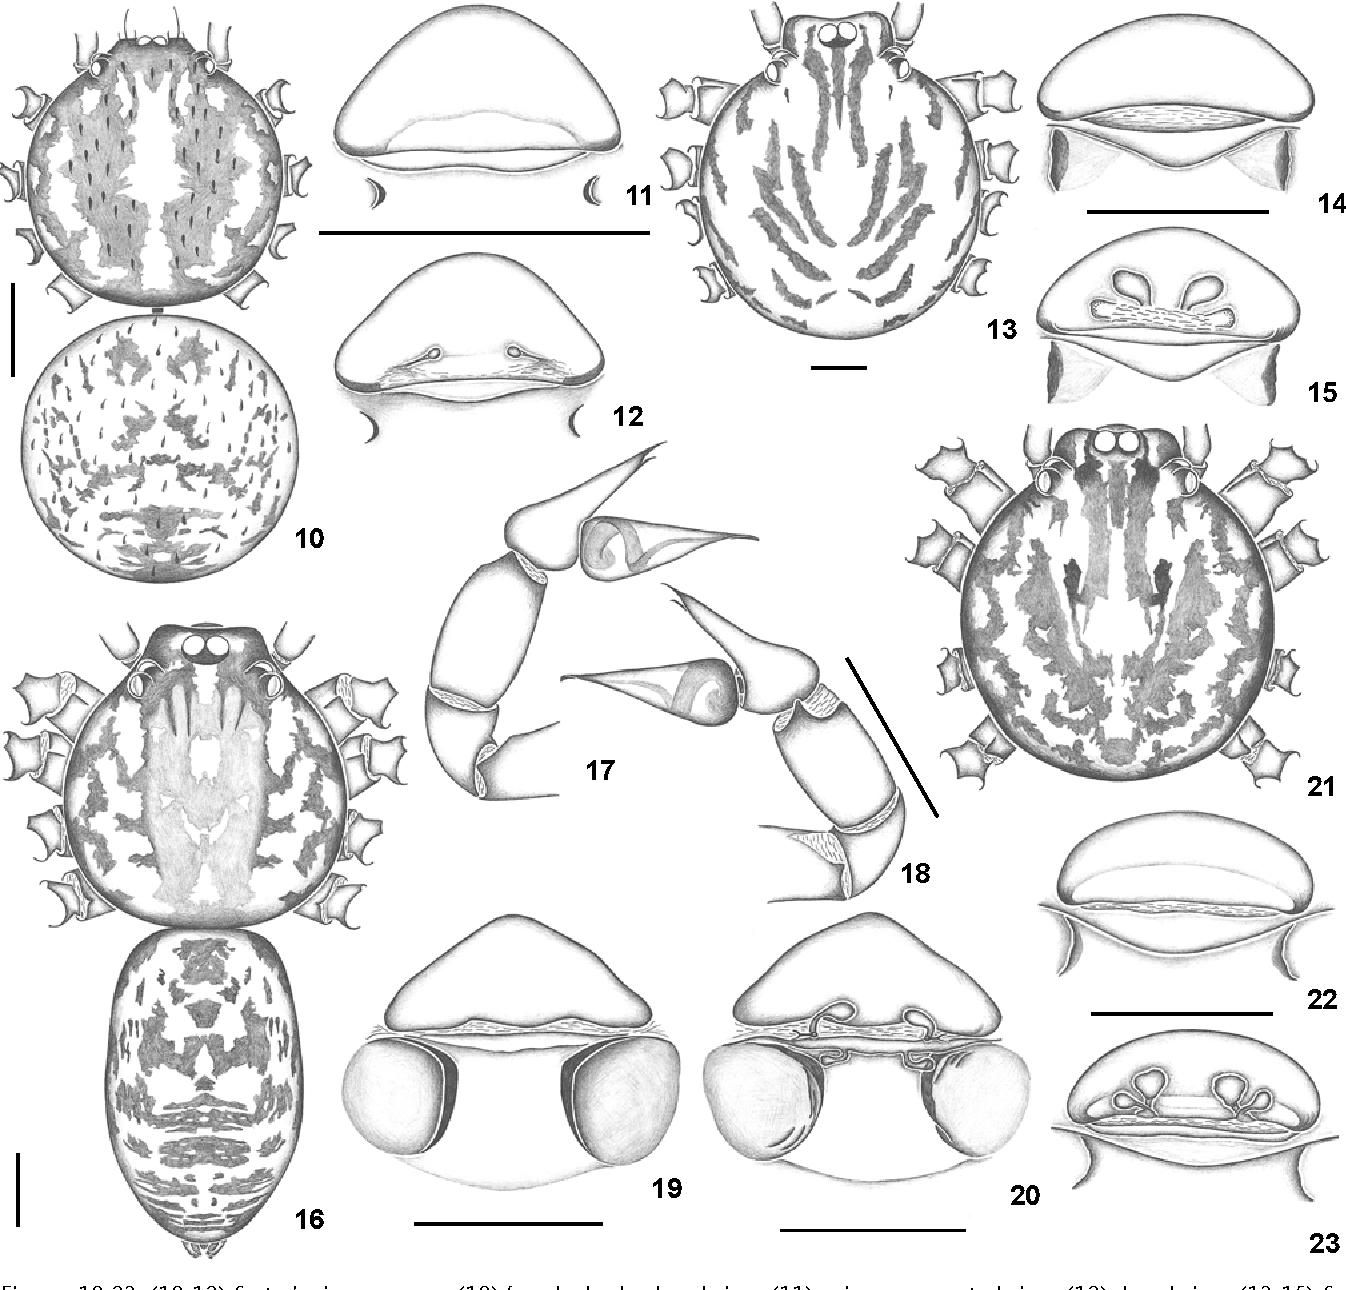 figure 10-23